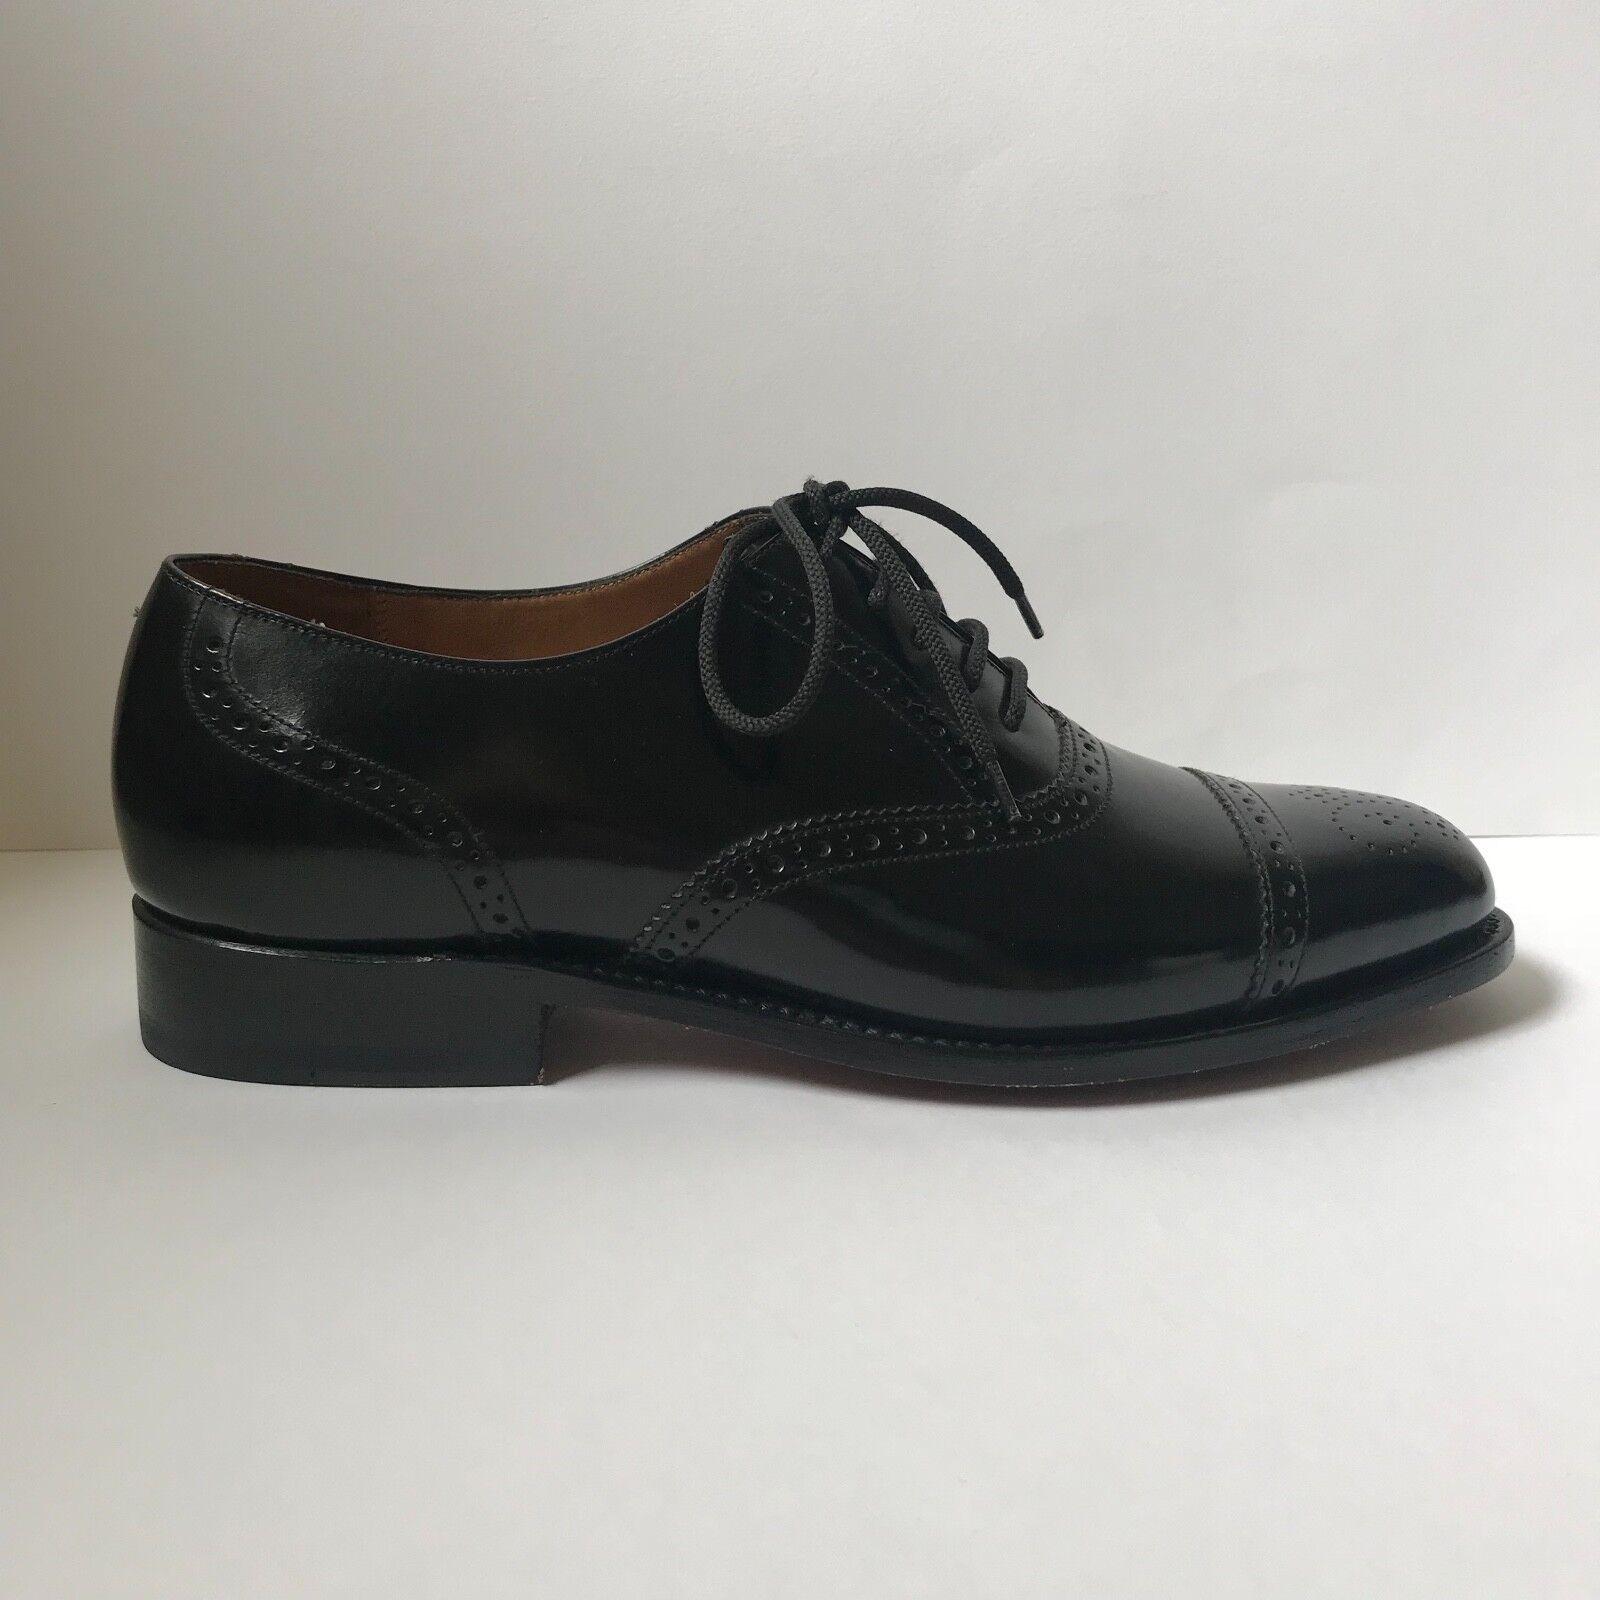 Barker England Black Leather Traditional Semi-Brogue shoes UK 7 G Fitting EU 41